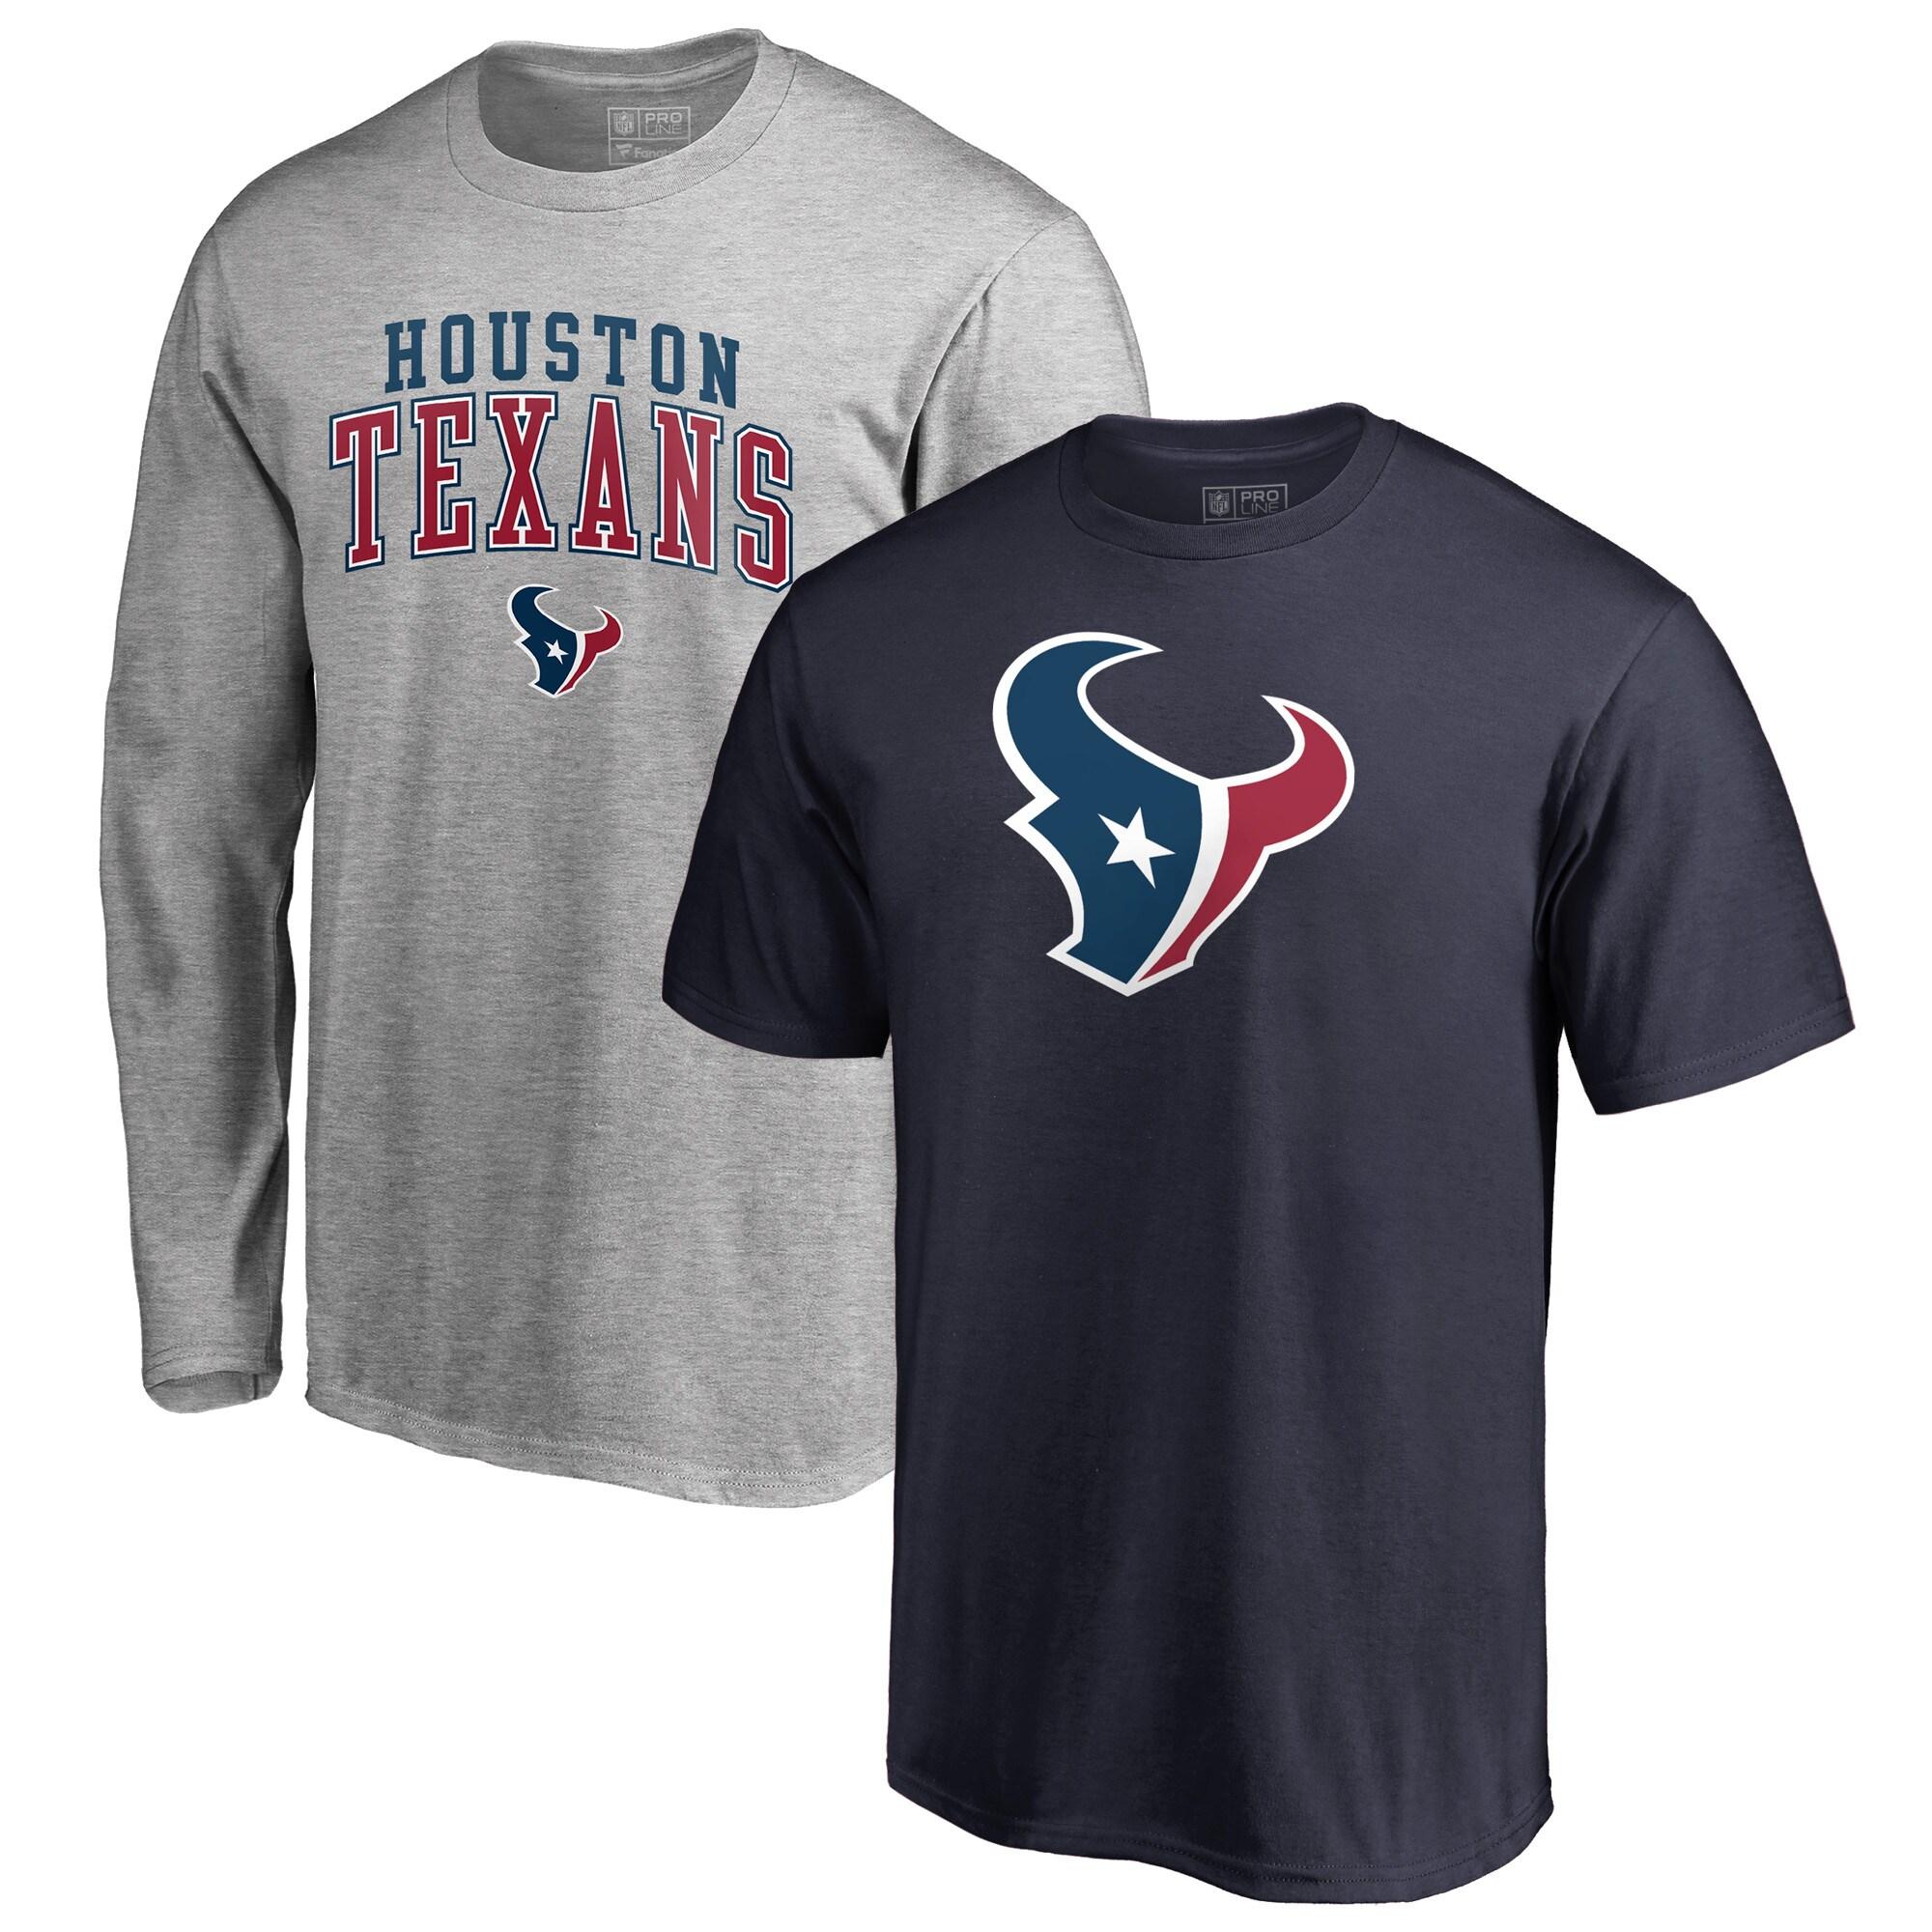 Houston Texans NFL Pro Line by Fanatics Branded Square Up T-Shirt Combo Set - Navy/Gray